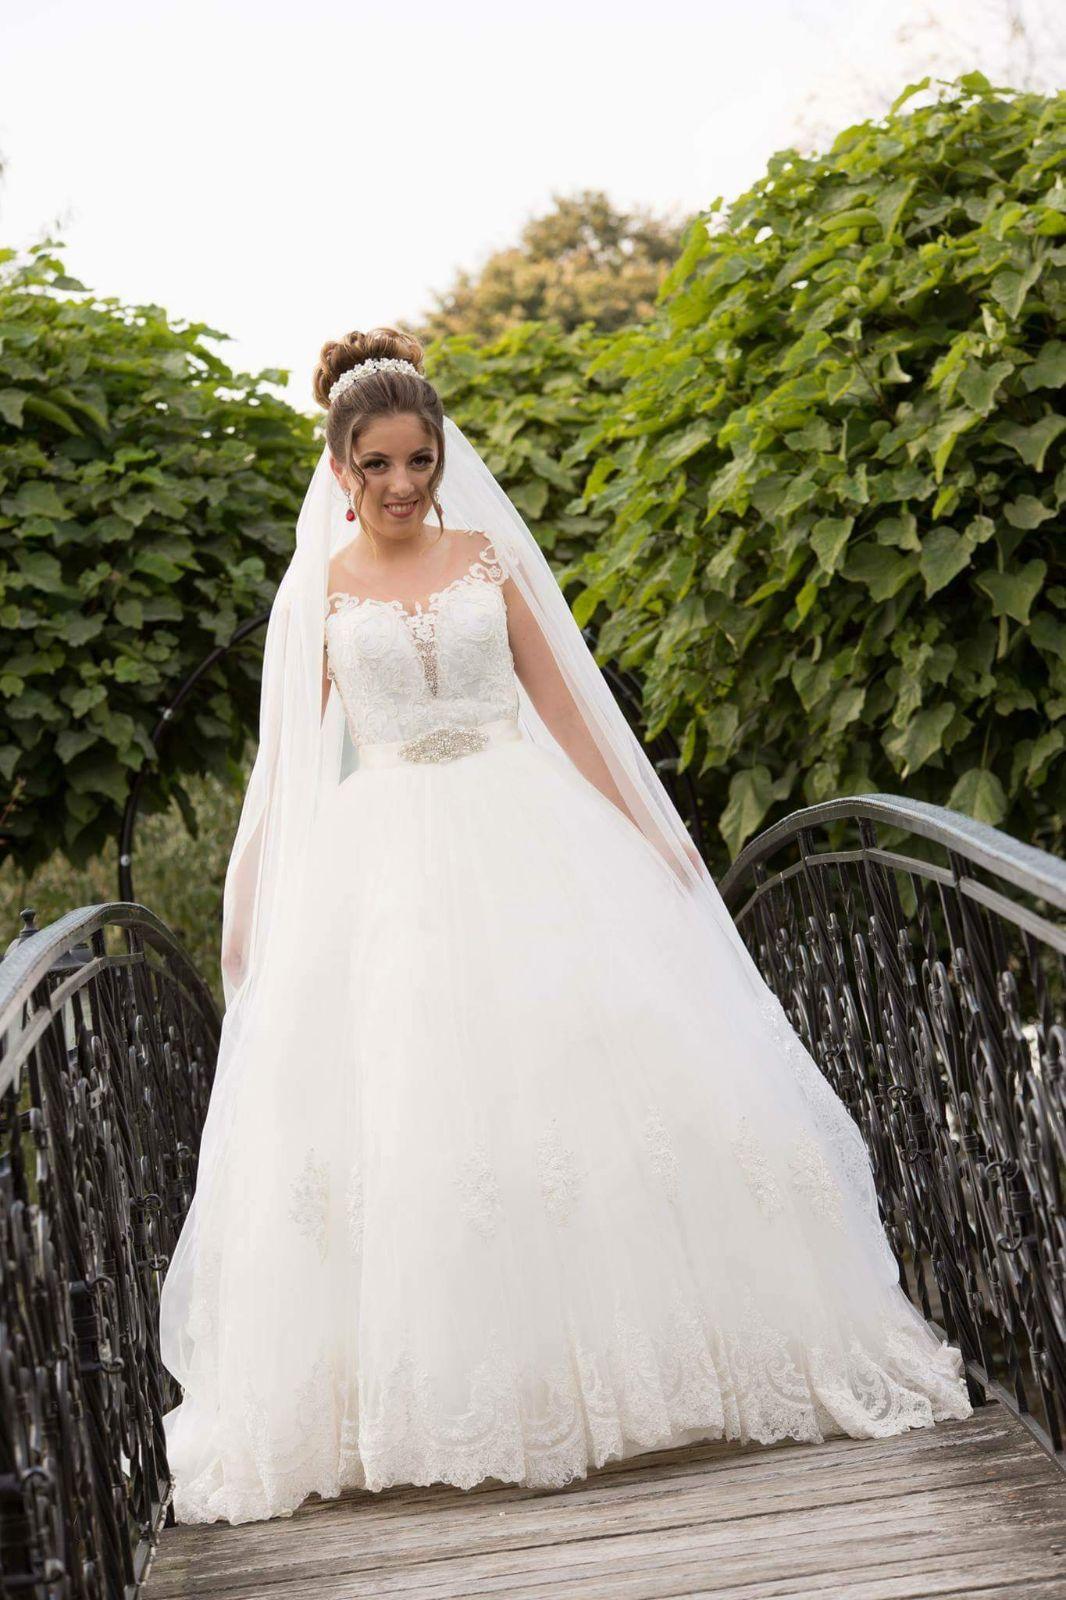 ancuta adora rochia de mireasa 5 in 1 (22)